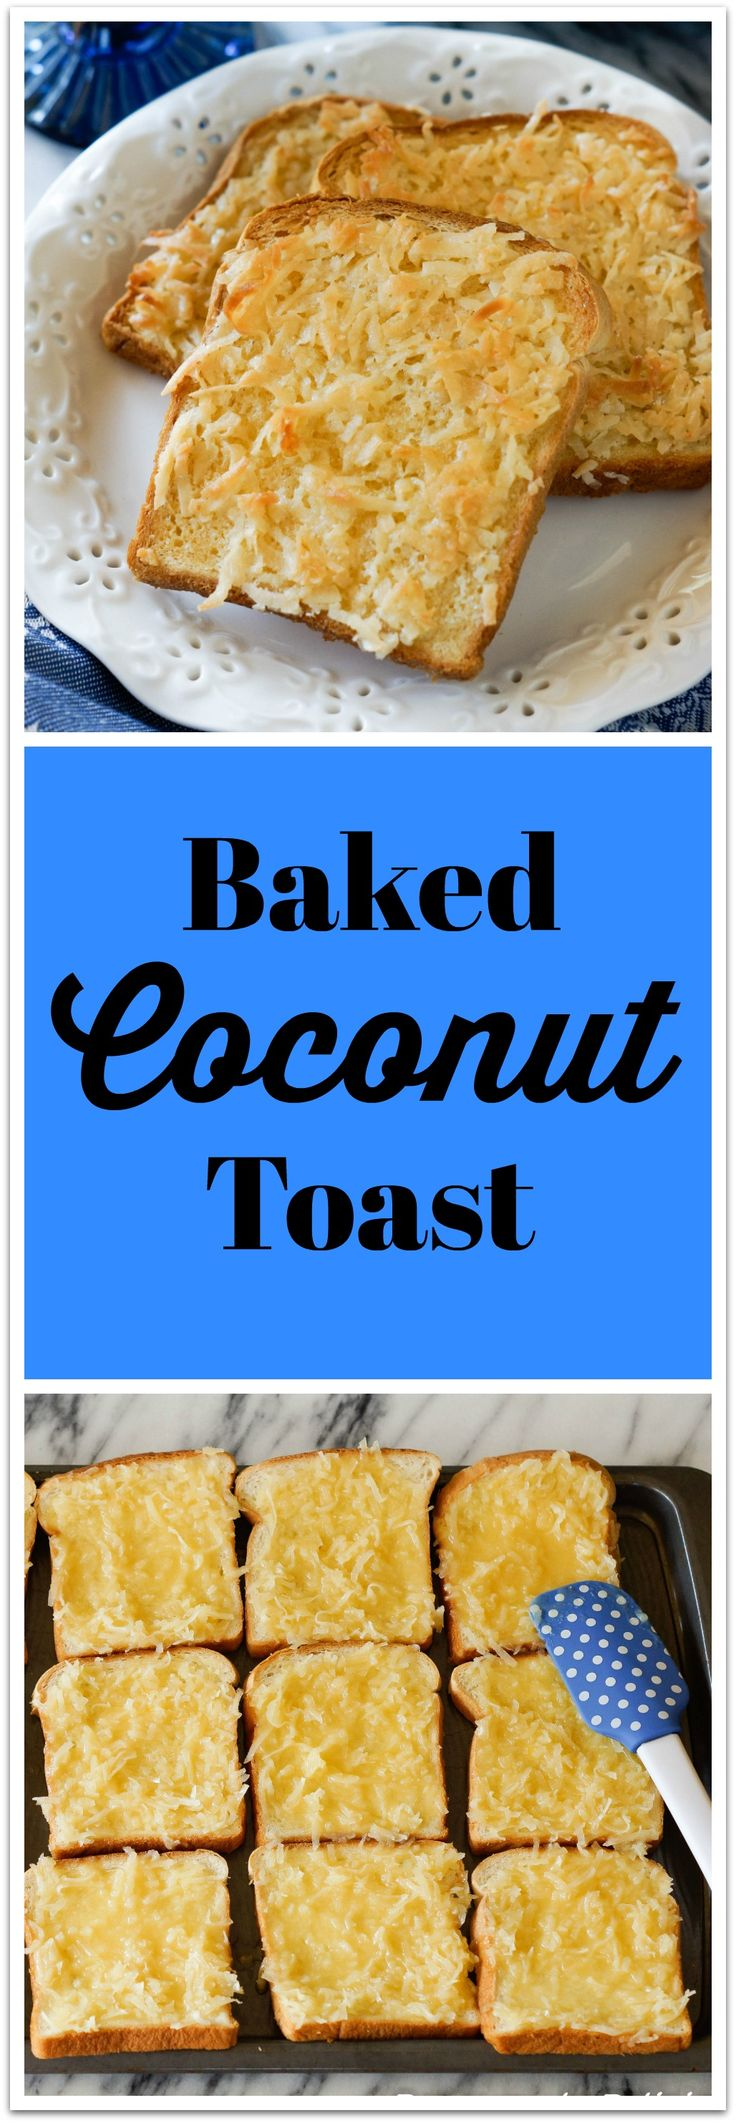 Baked Coconut Toast